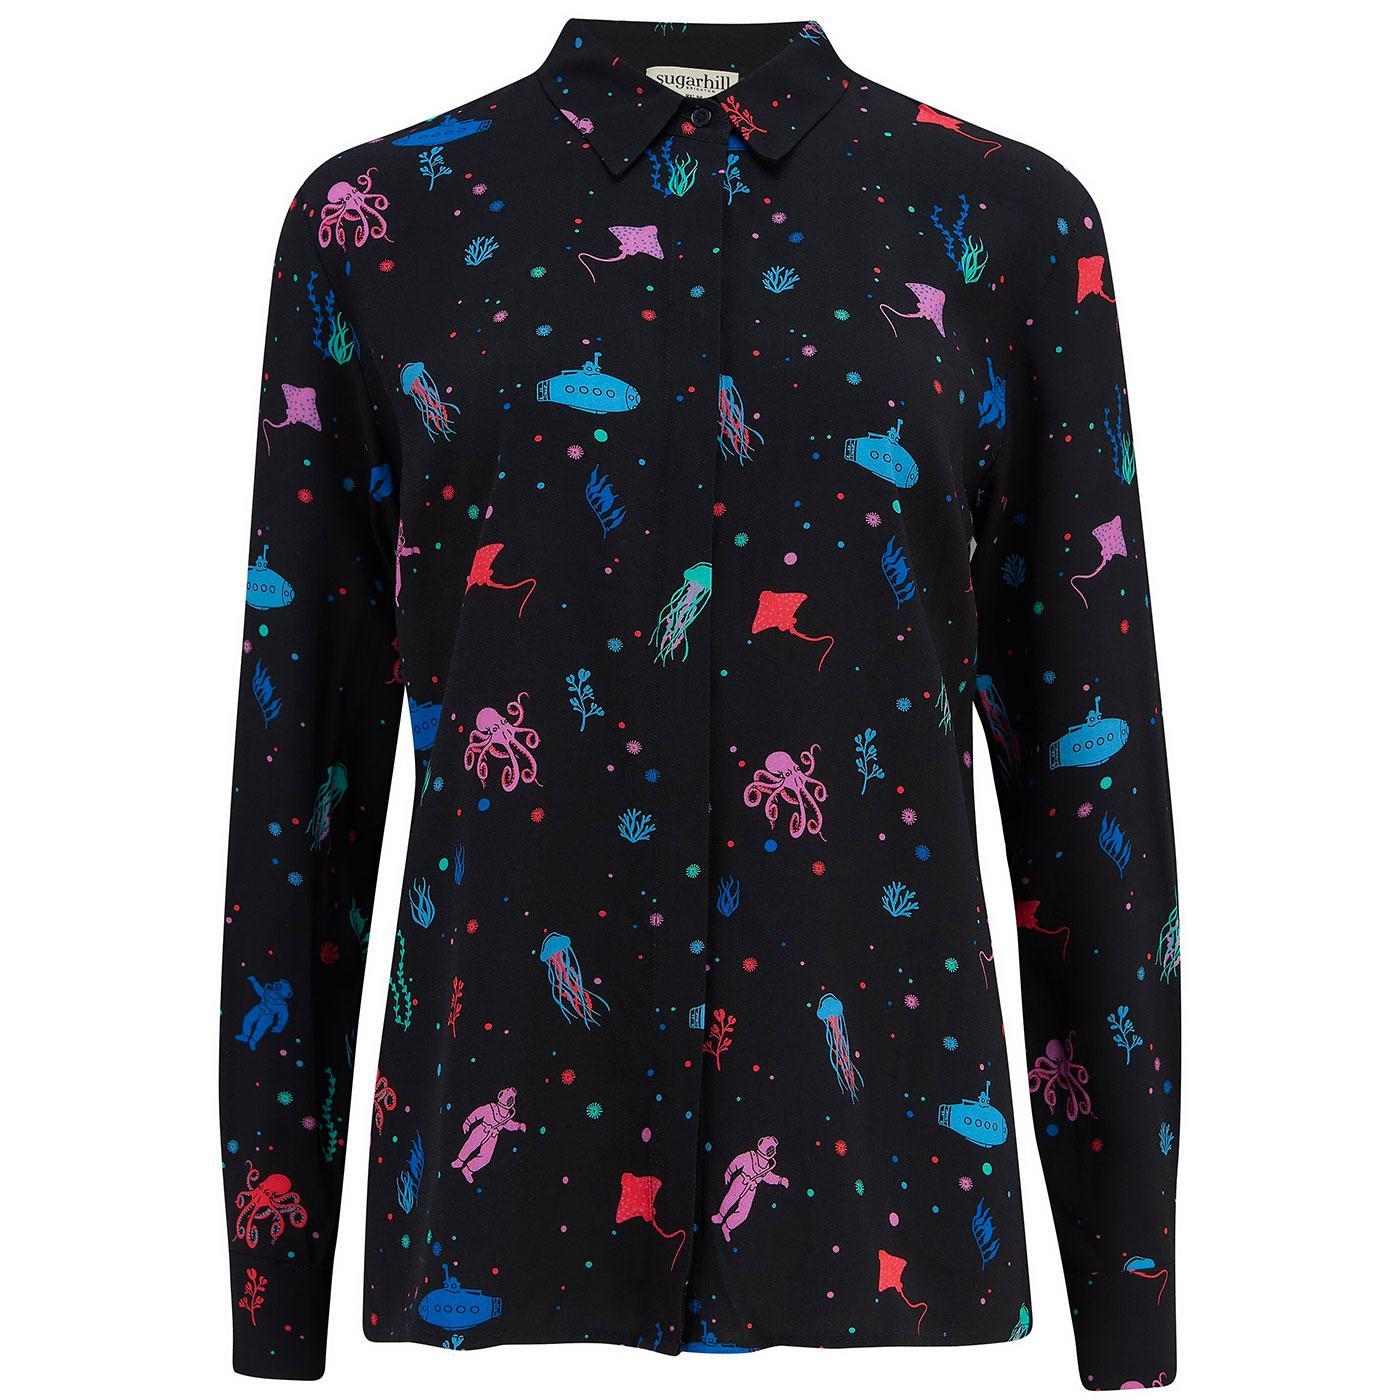 Joy SUGARHILL BRIGHTON Deep Sea Retro Shirt